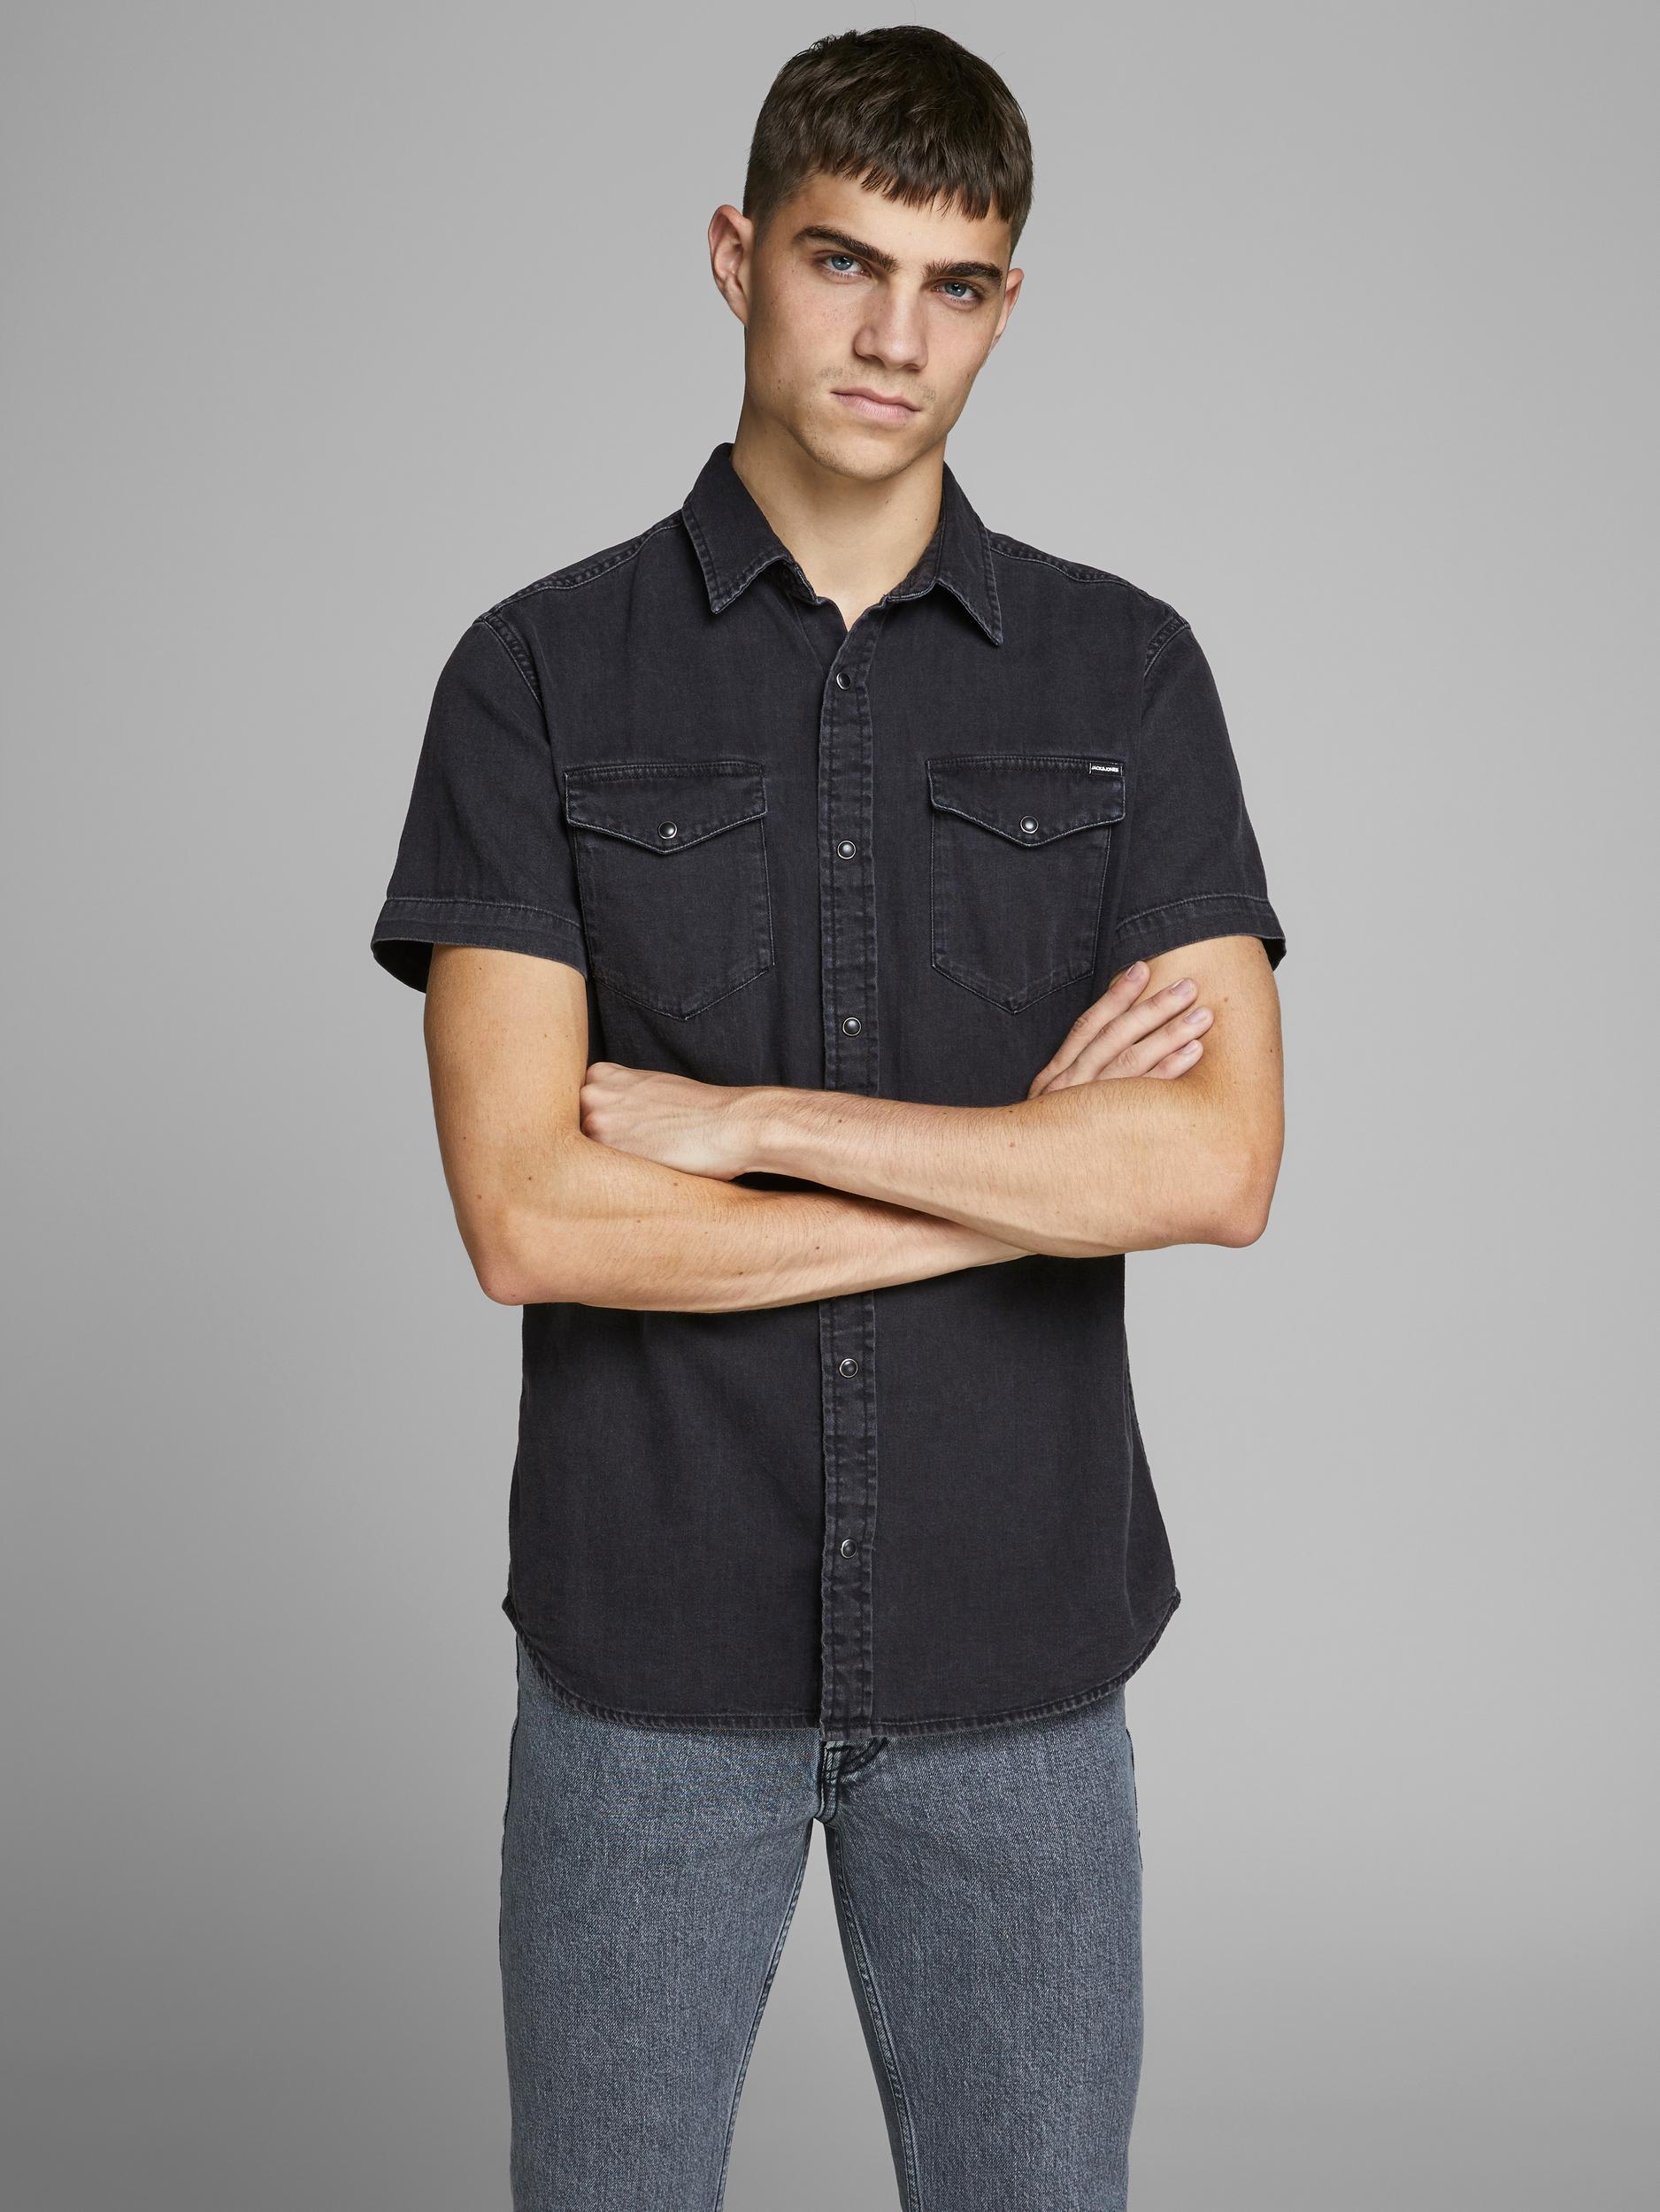 Jack & Jones Heridan skjorte S/S, black denim, large